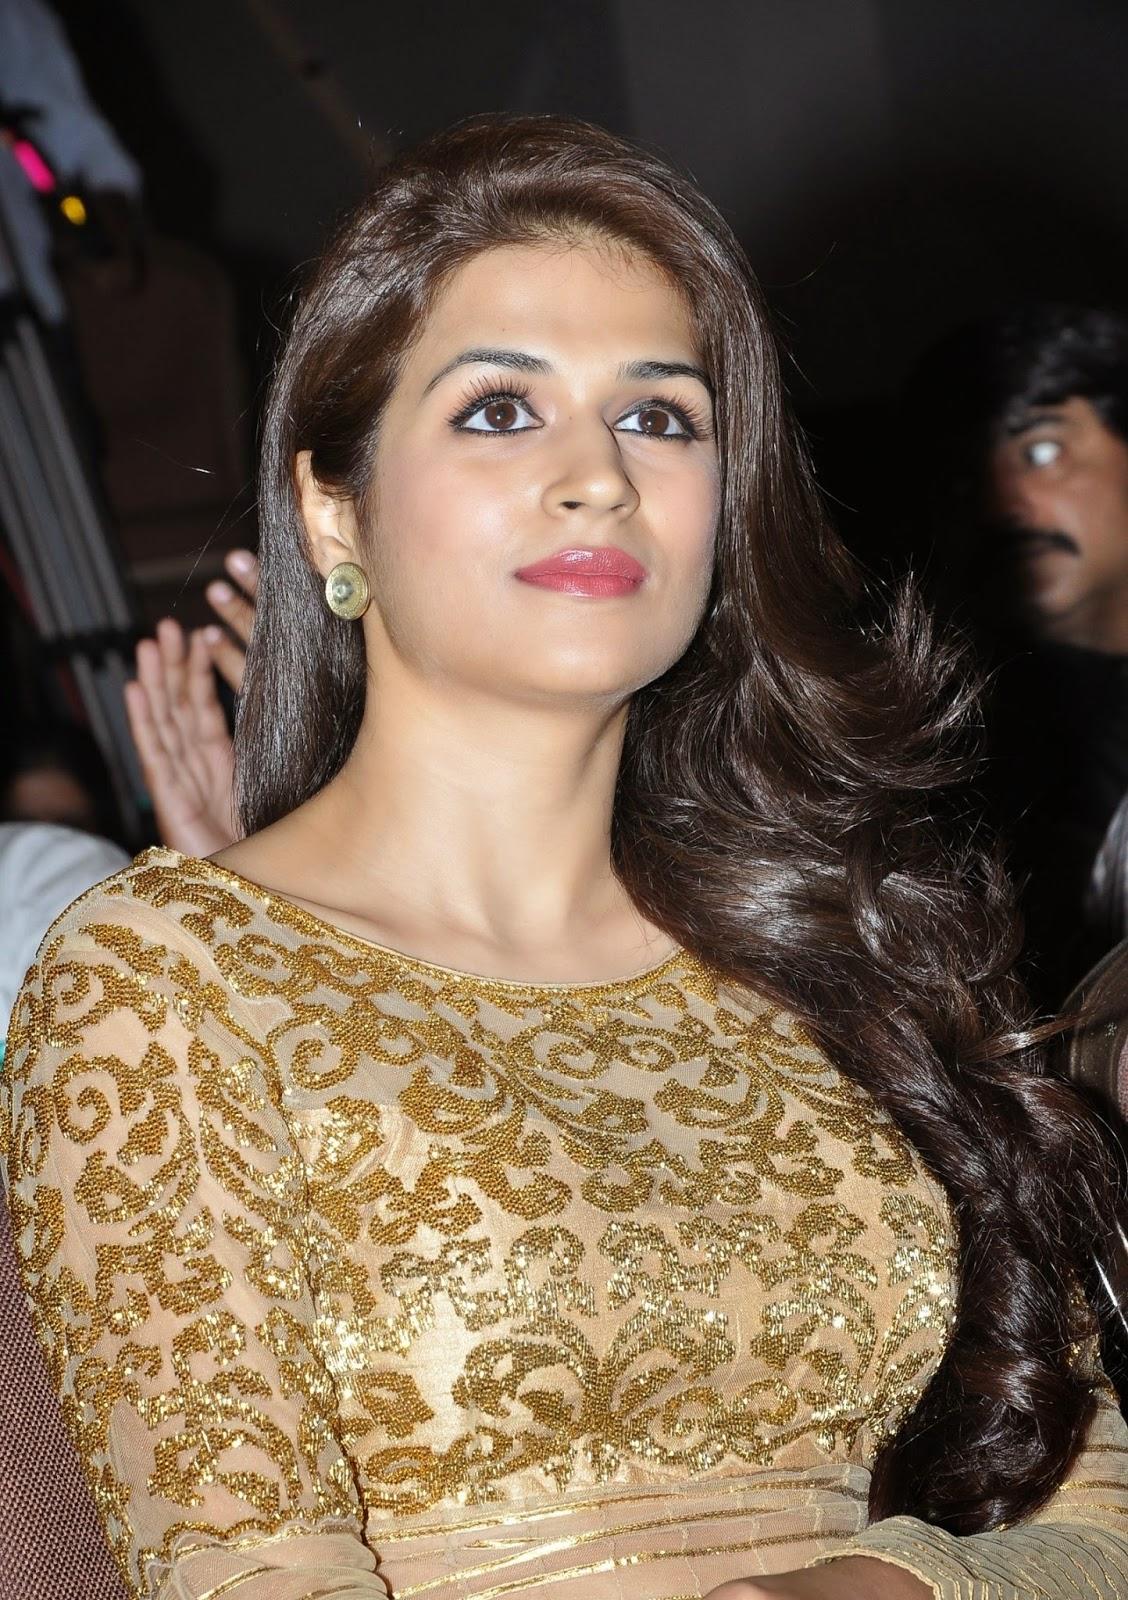 High Quality Bollywood Celebrity Pictures: Shraddha Das ...